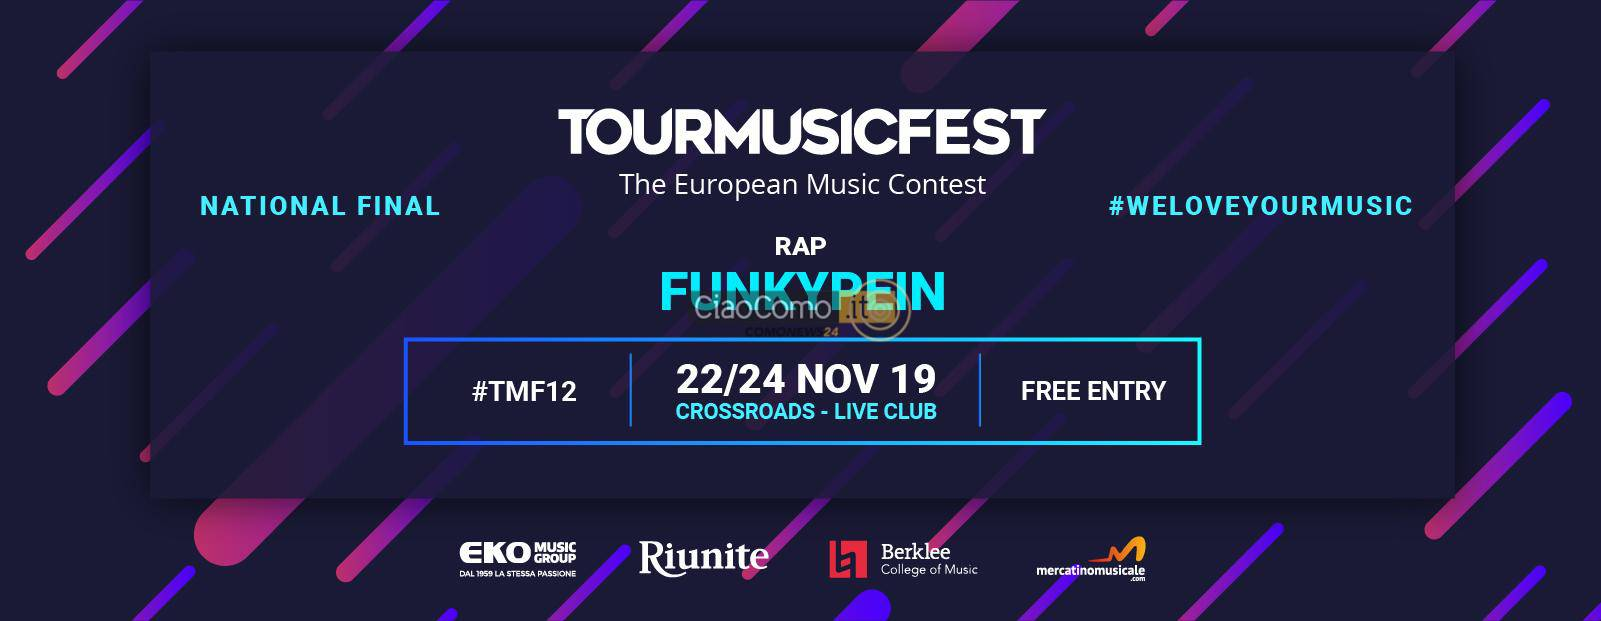 Comunicato Stampa FunkyPein - Tour Music Fest 2019